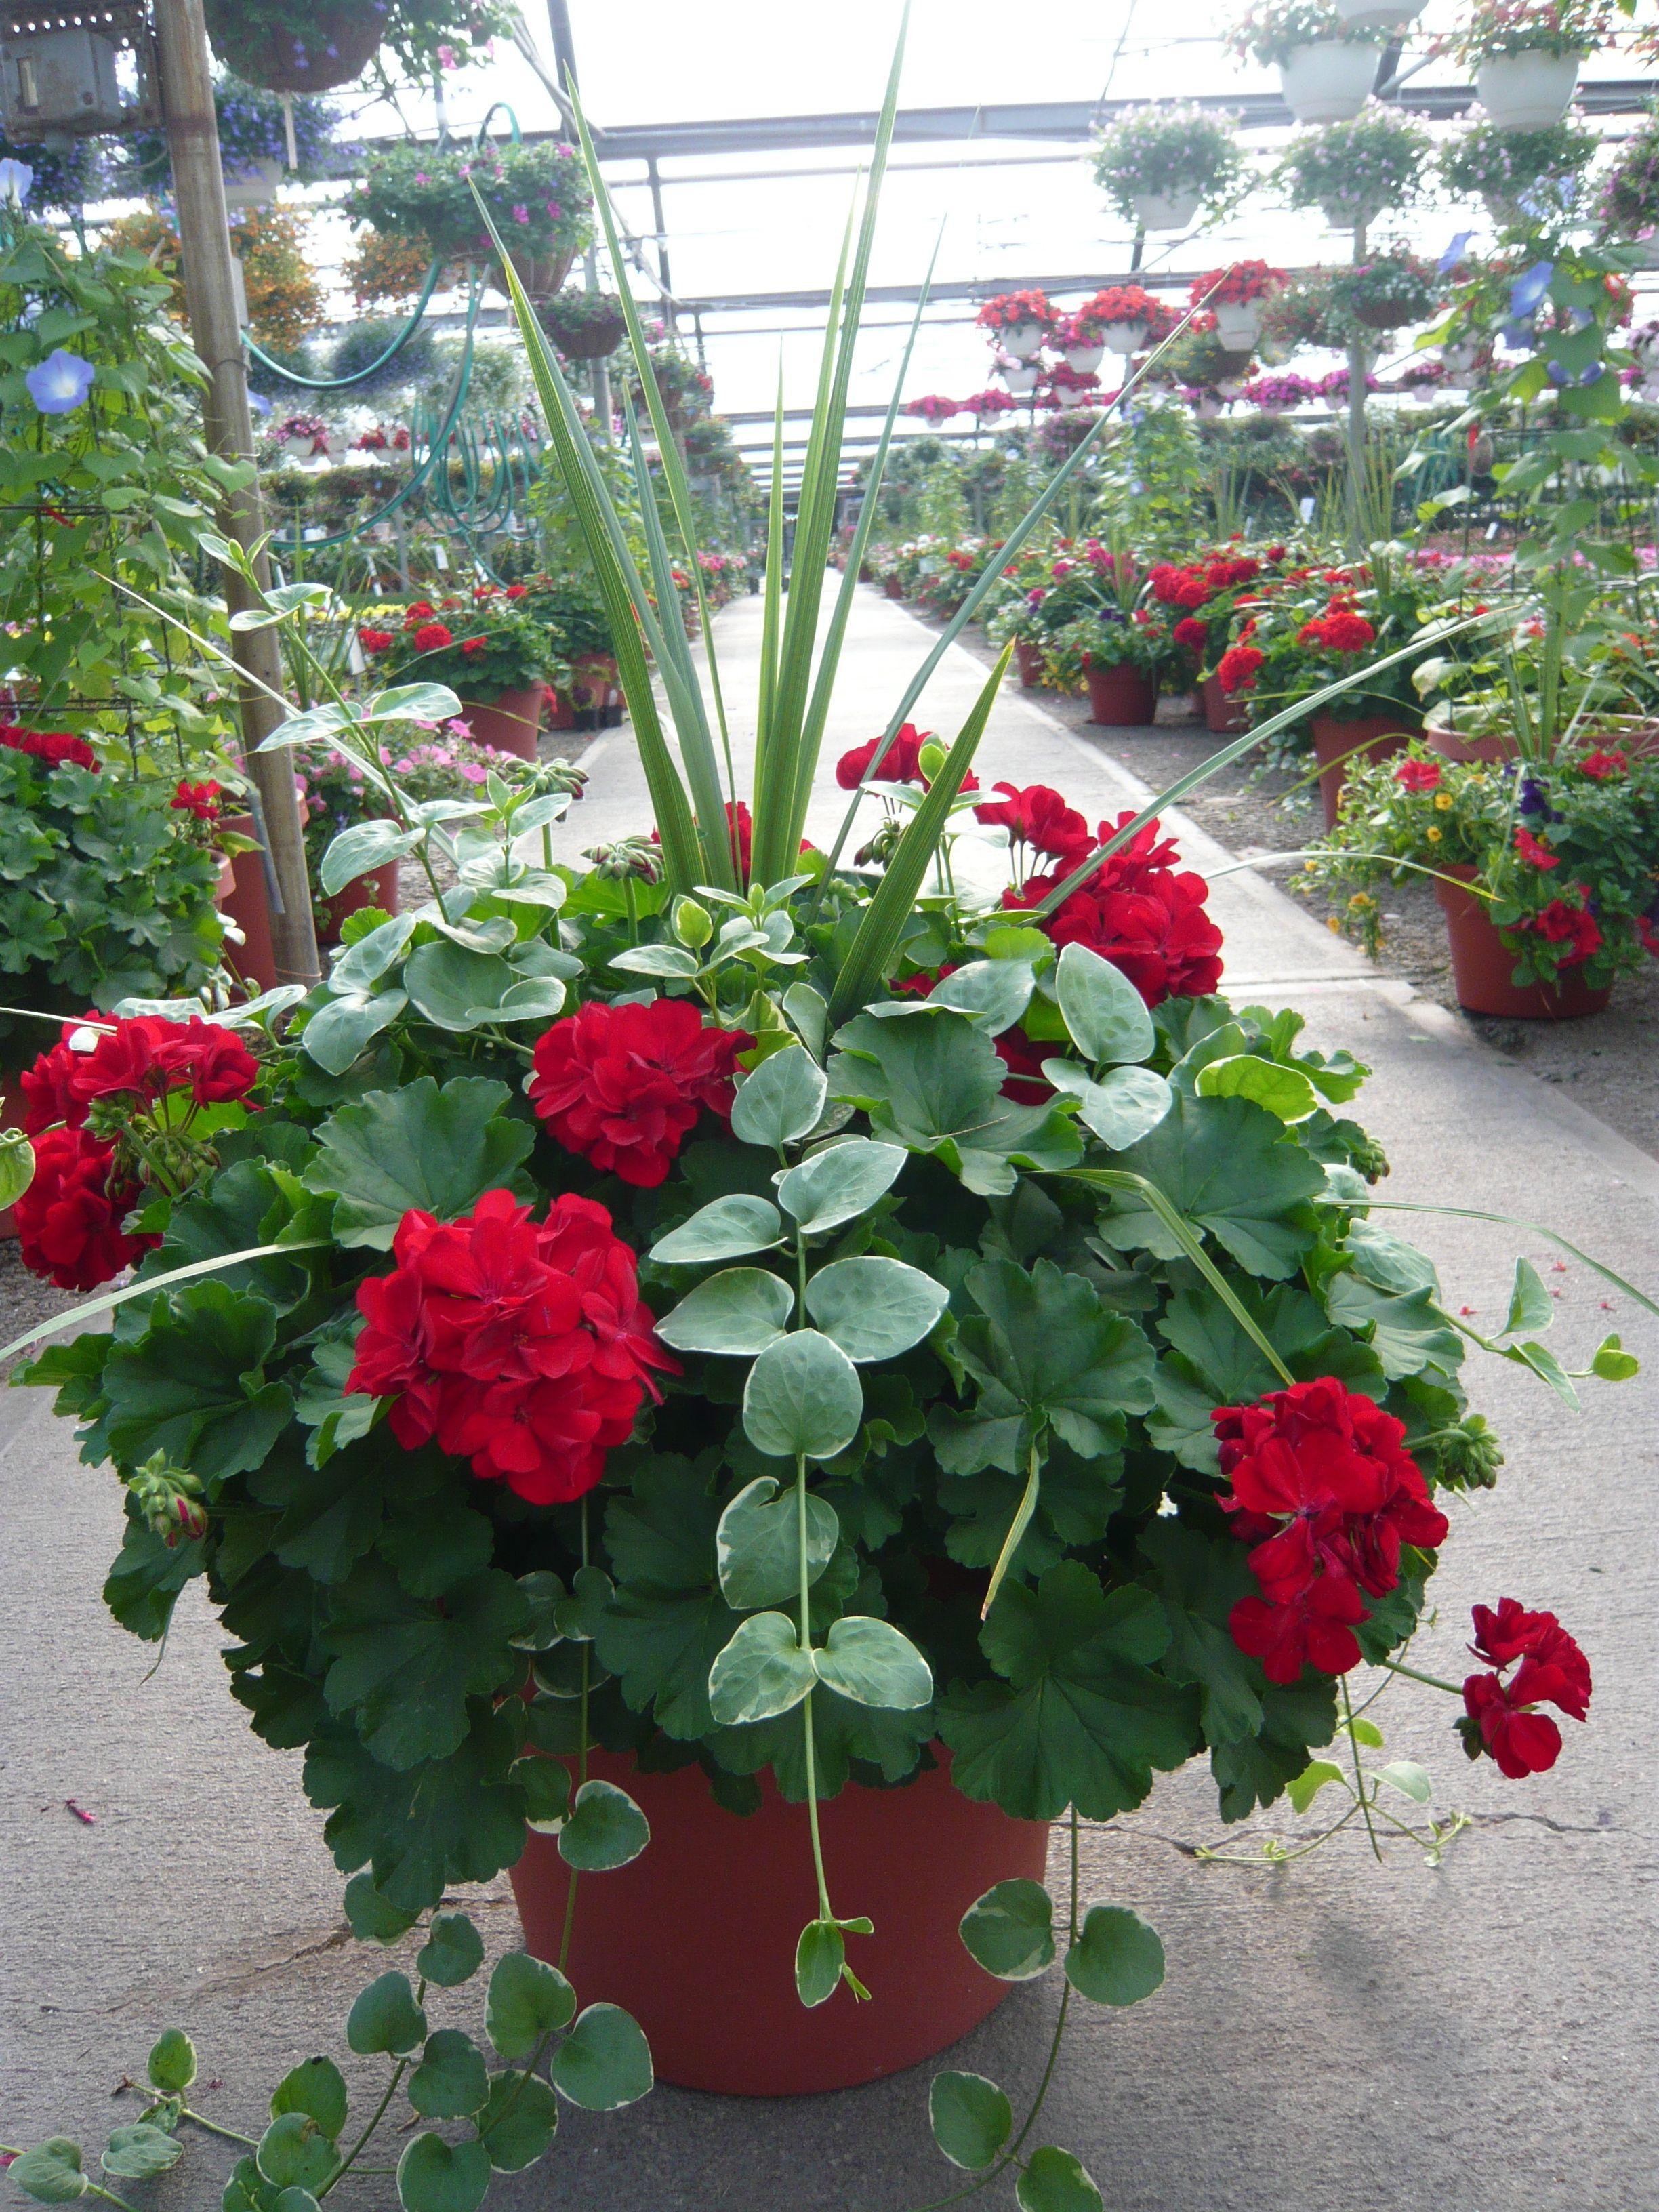 Geranium Dracena The Spiky Stuff And Vinca Vine Planter With Images Flower Garden Design Container